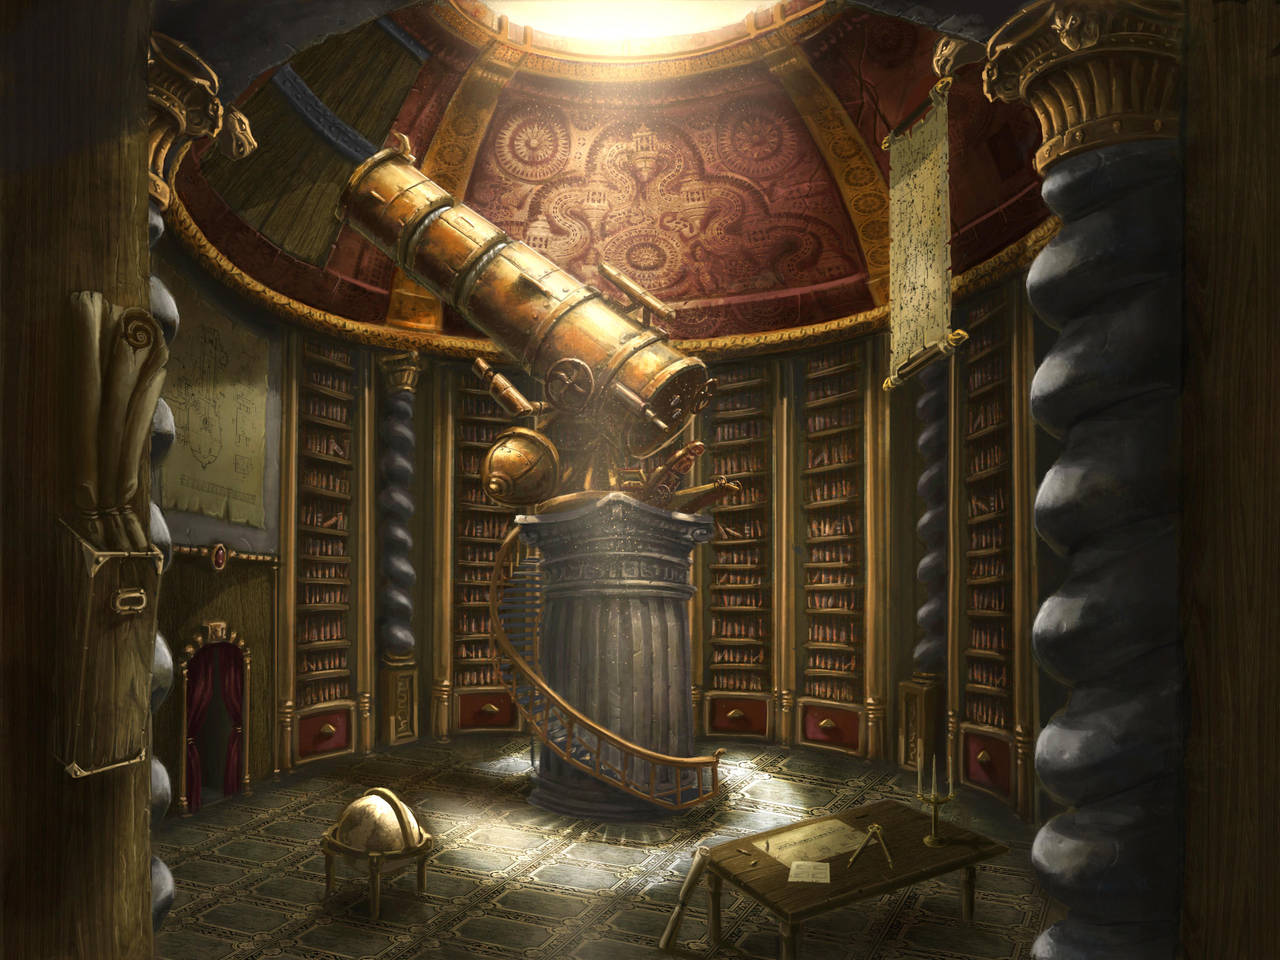 Observatory room by ARTOFJUSTAMAN